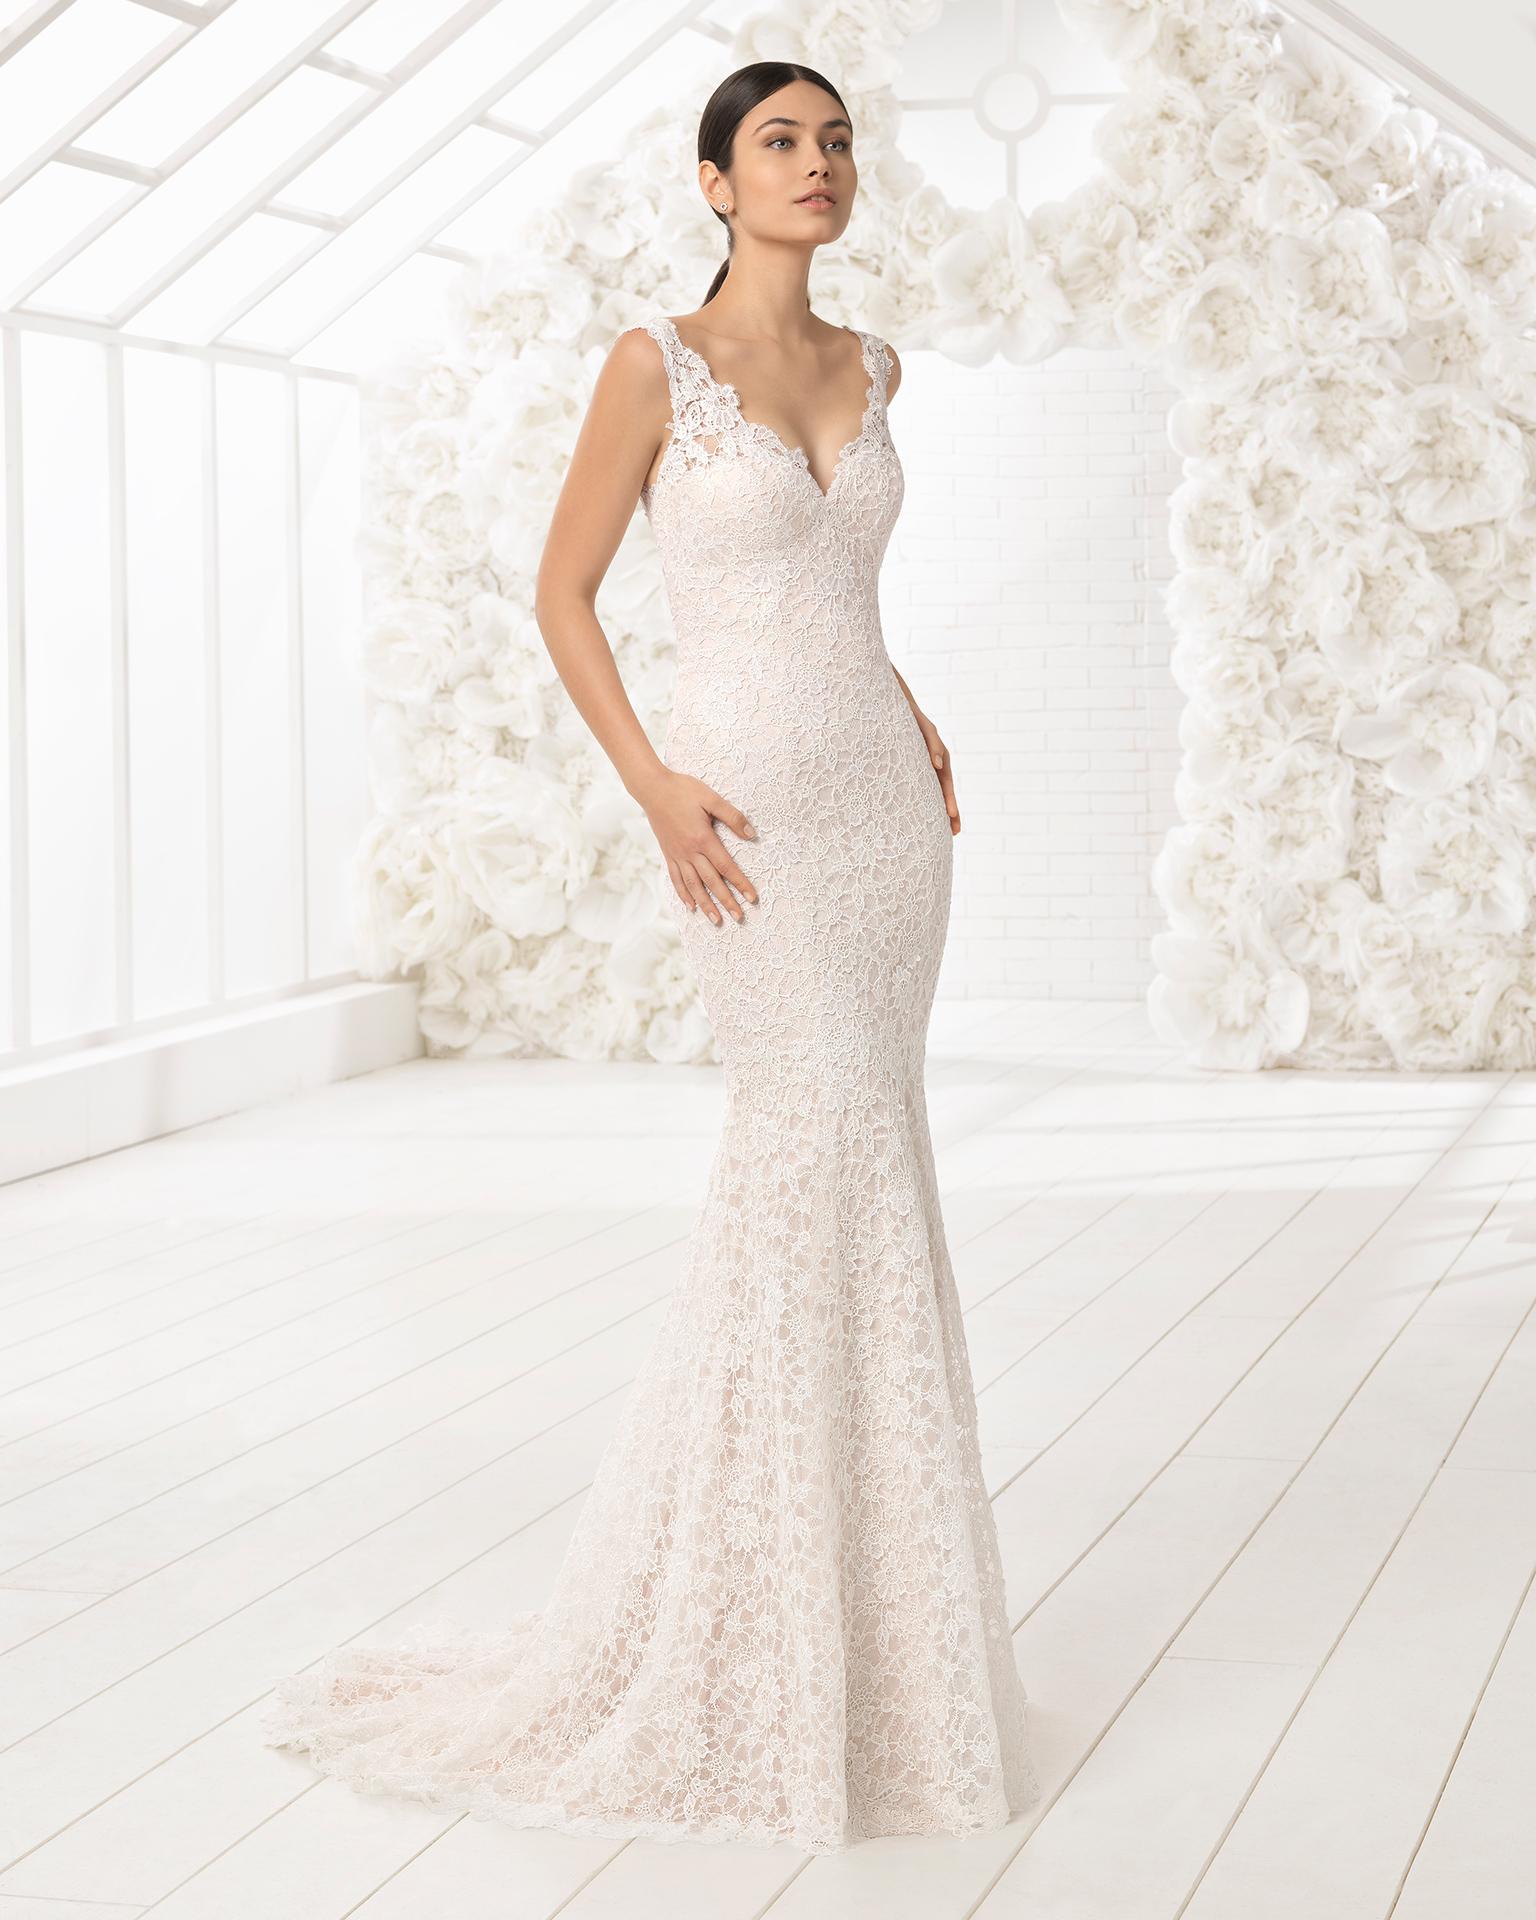 LONDON - 2018 Bridal Collection. Rosa Clará Soft Collection